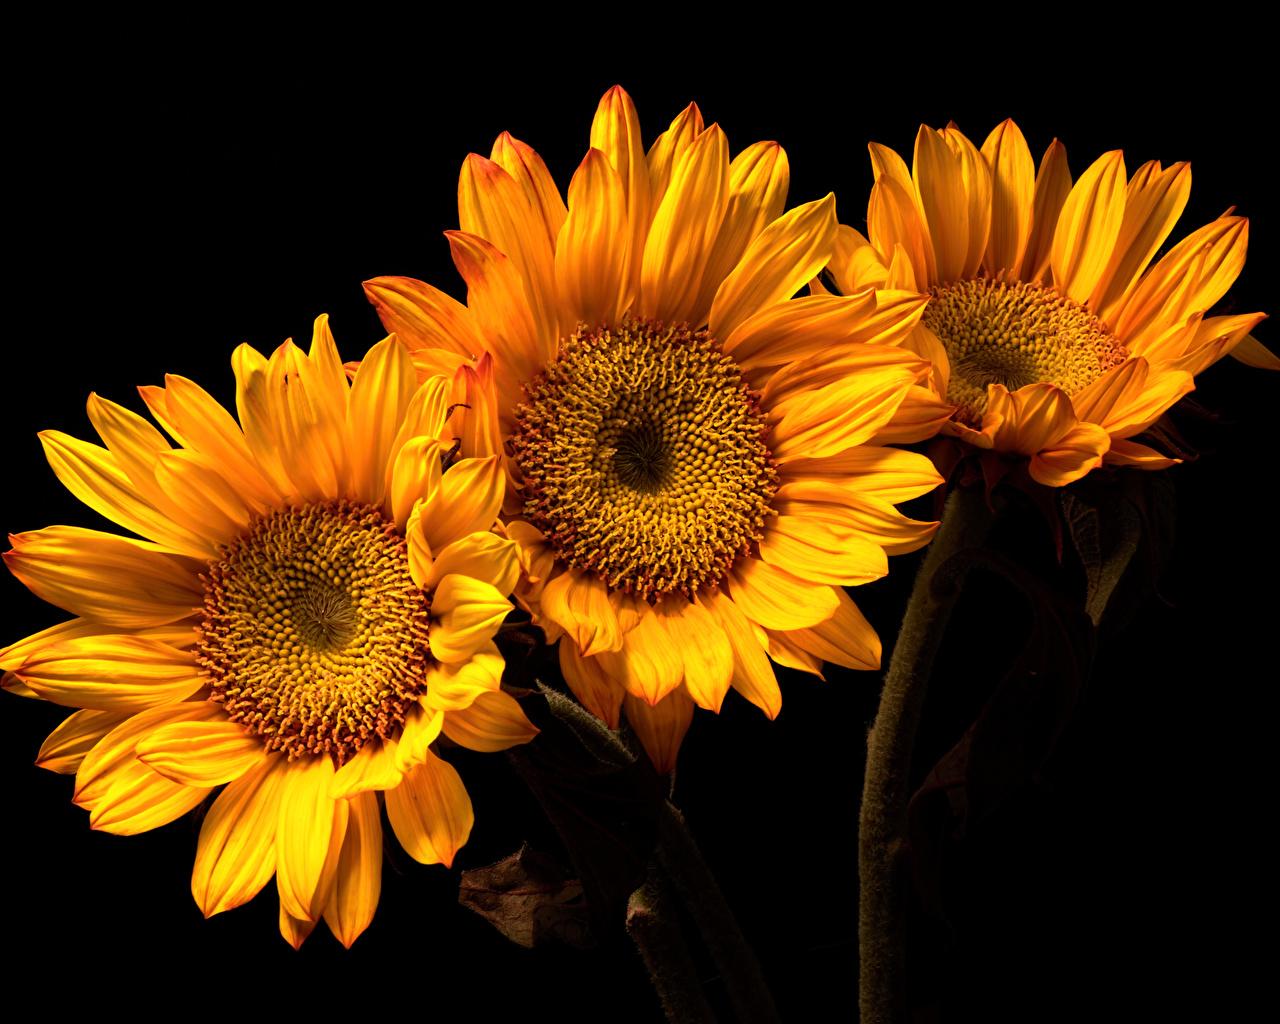 Wallpaper Flowers Sunflowers Three 3 Closeup Black background flower Helianthus